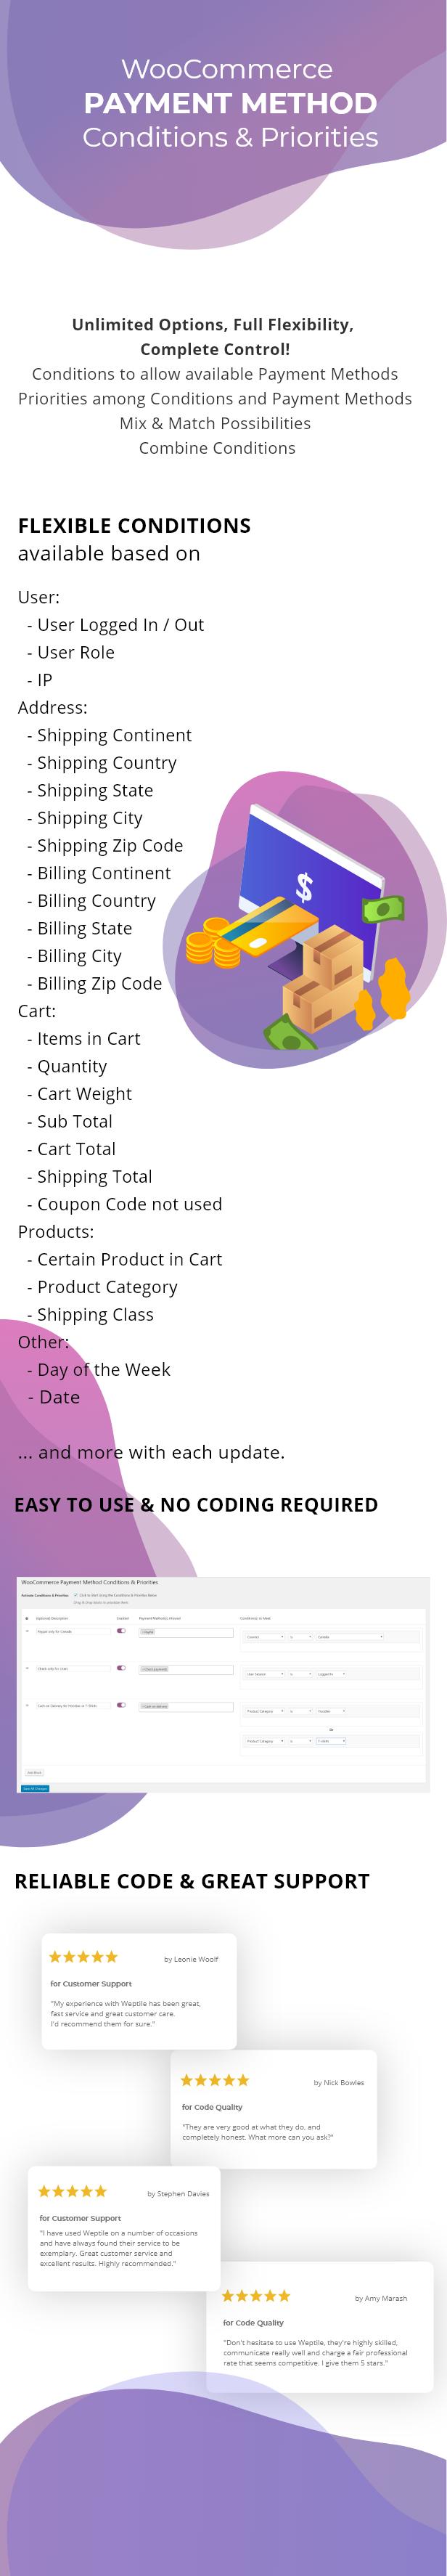 WooCommerce Payment Method Conditions & Priorities - 1